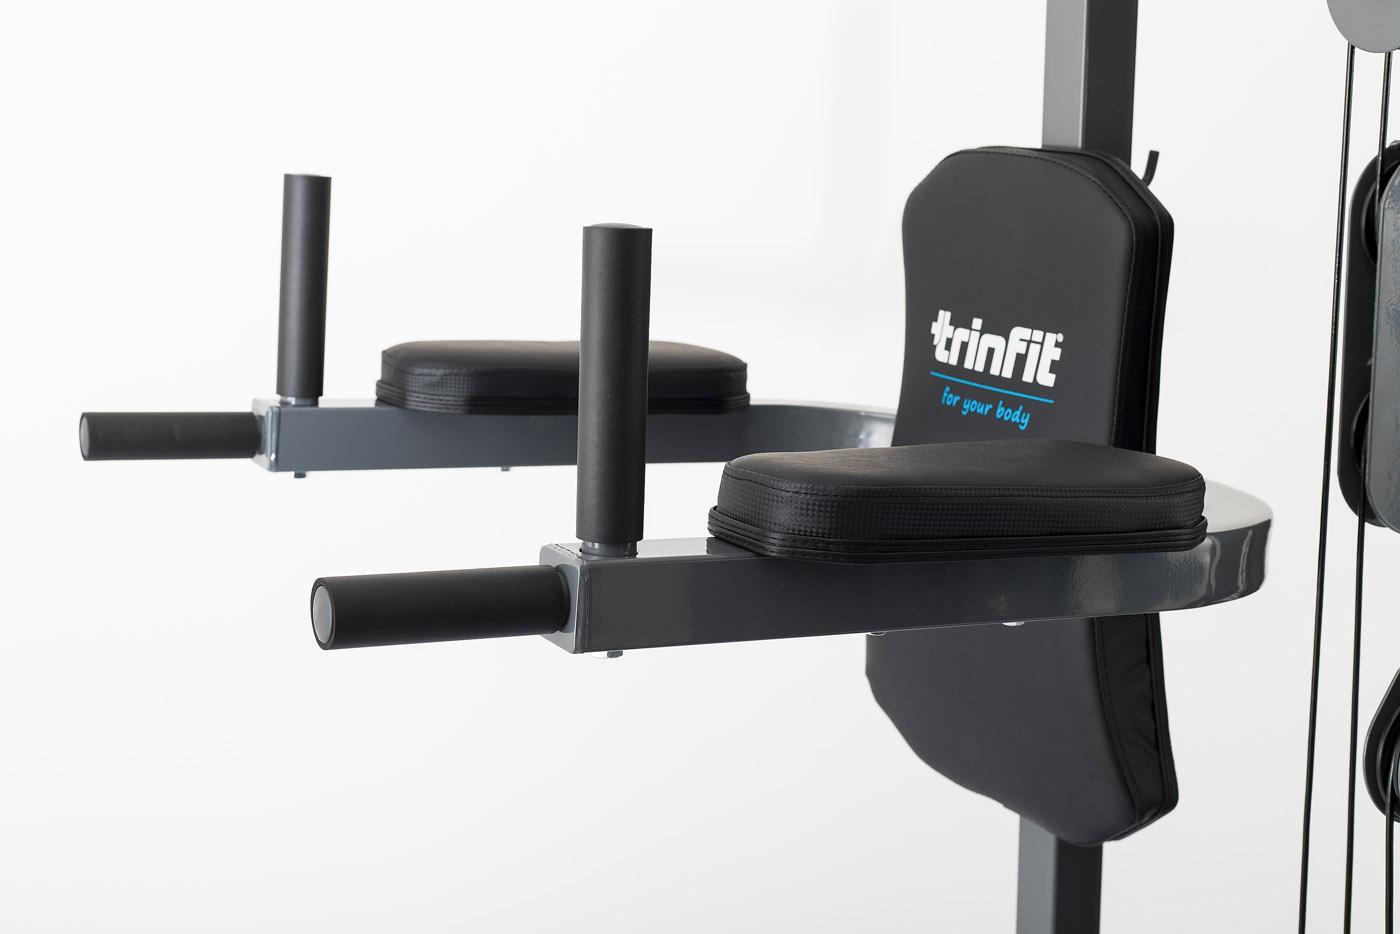 TRINFIT Gym GX7 bradla det